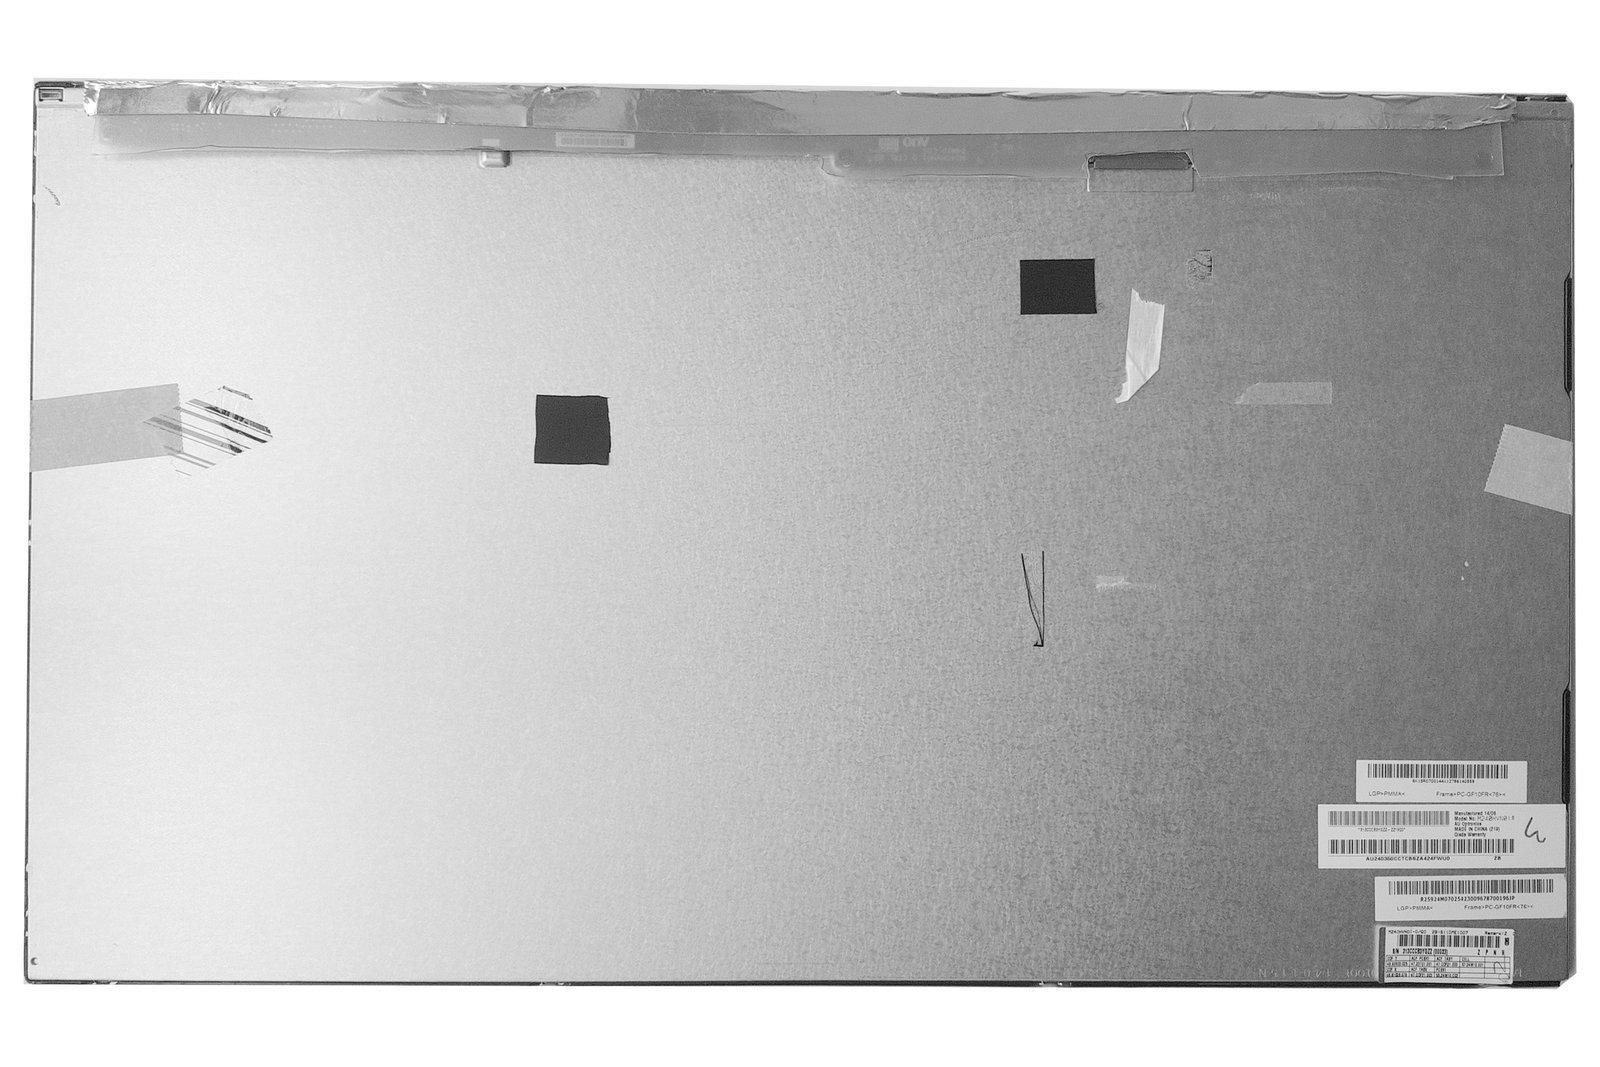 Bildschirm Display AUO 24' M240HVN01.0 1920 x 1080